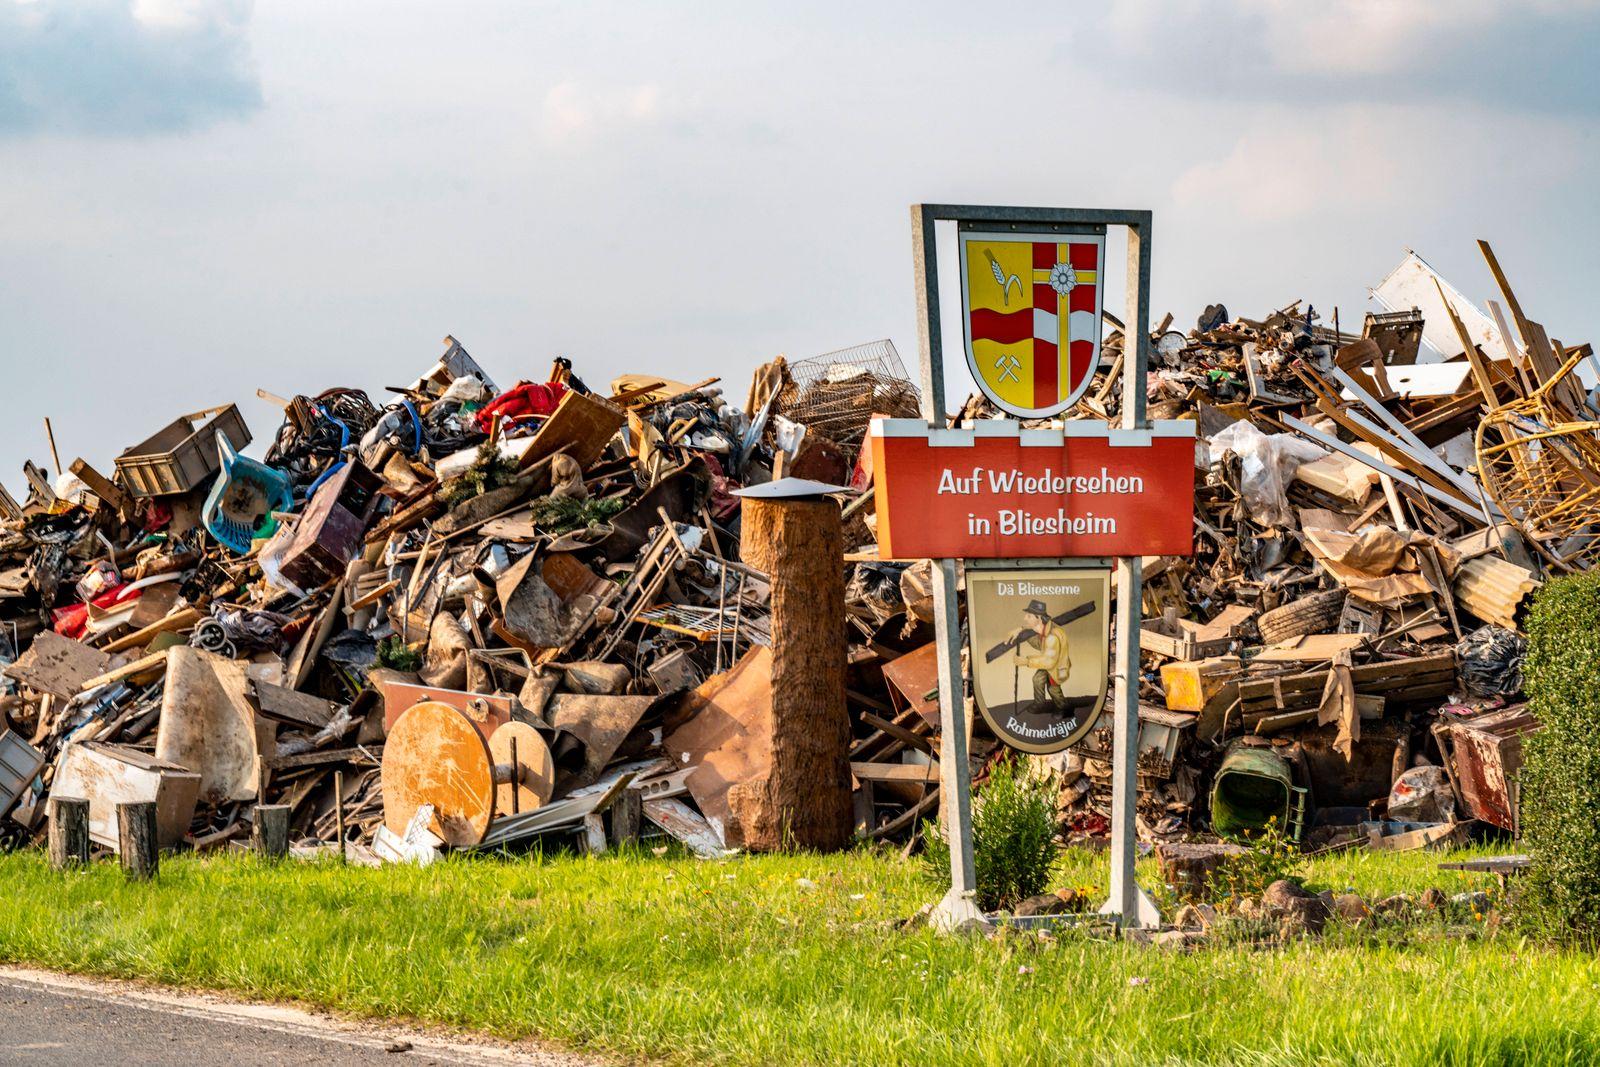 Hochwasser an der Erft, am Ortsausgang des Stadtteil Bliesheim, Erftstadt, wurde der Hausrat Müll gelagert, der aus den